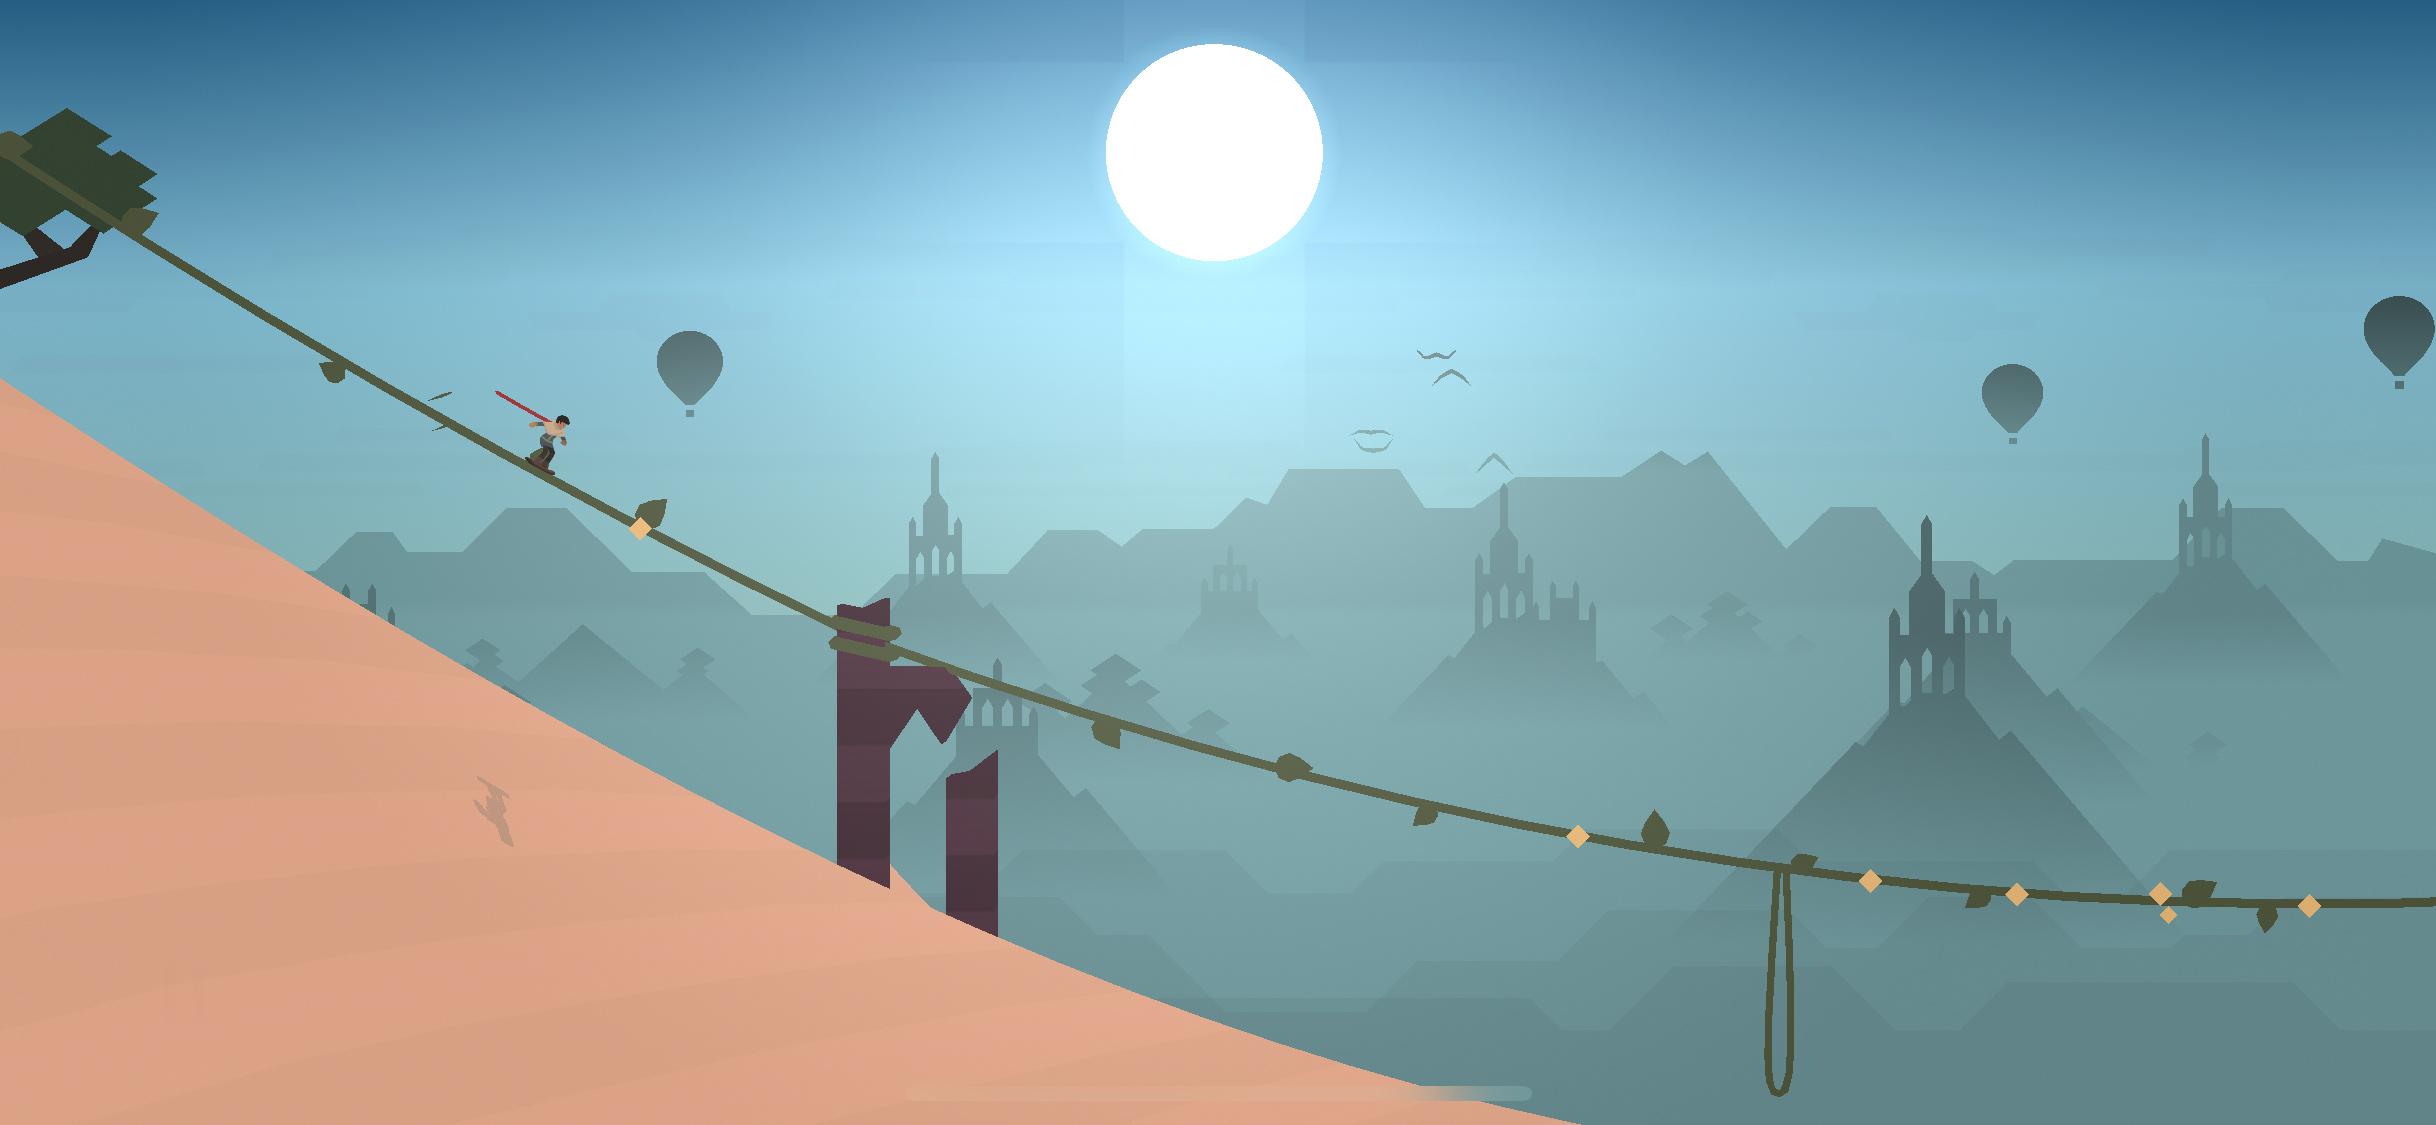 Alto's Odyssey desert